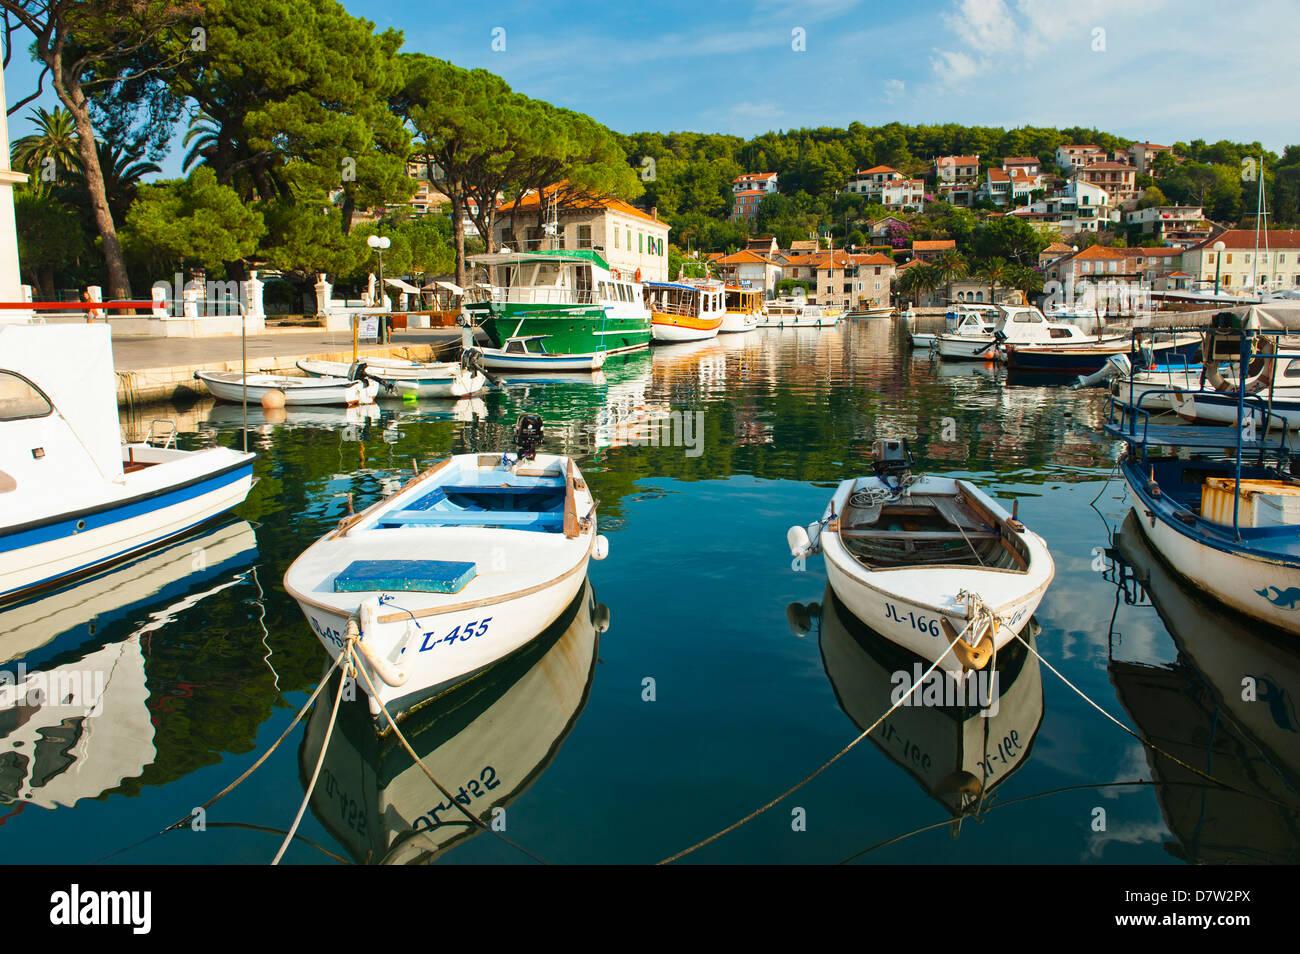 Jelsa Harbour on Hvar Island, Dalmatian Coast, Adriatic, Croatia - Stock Image